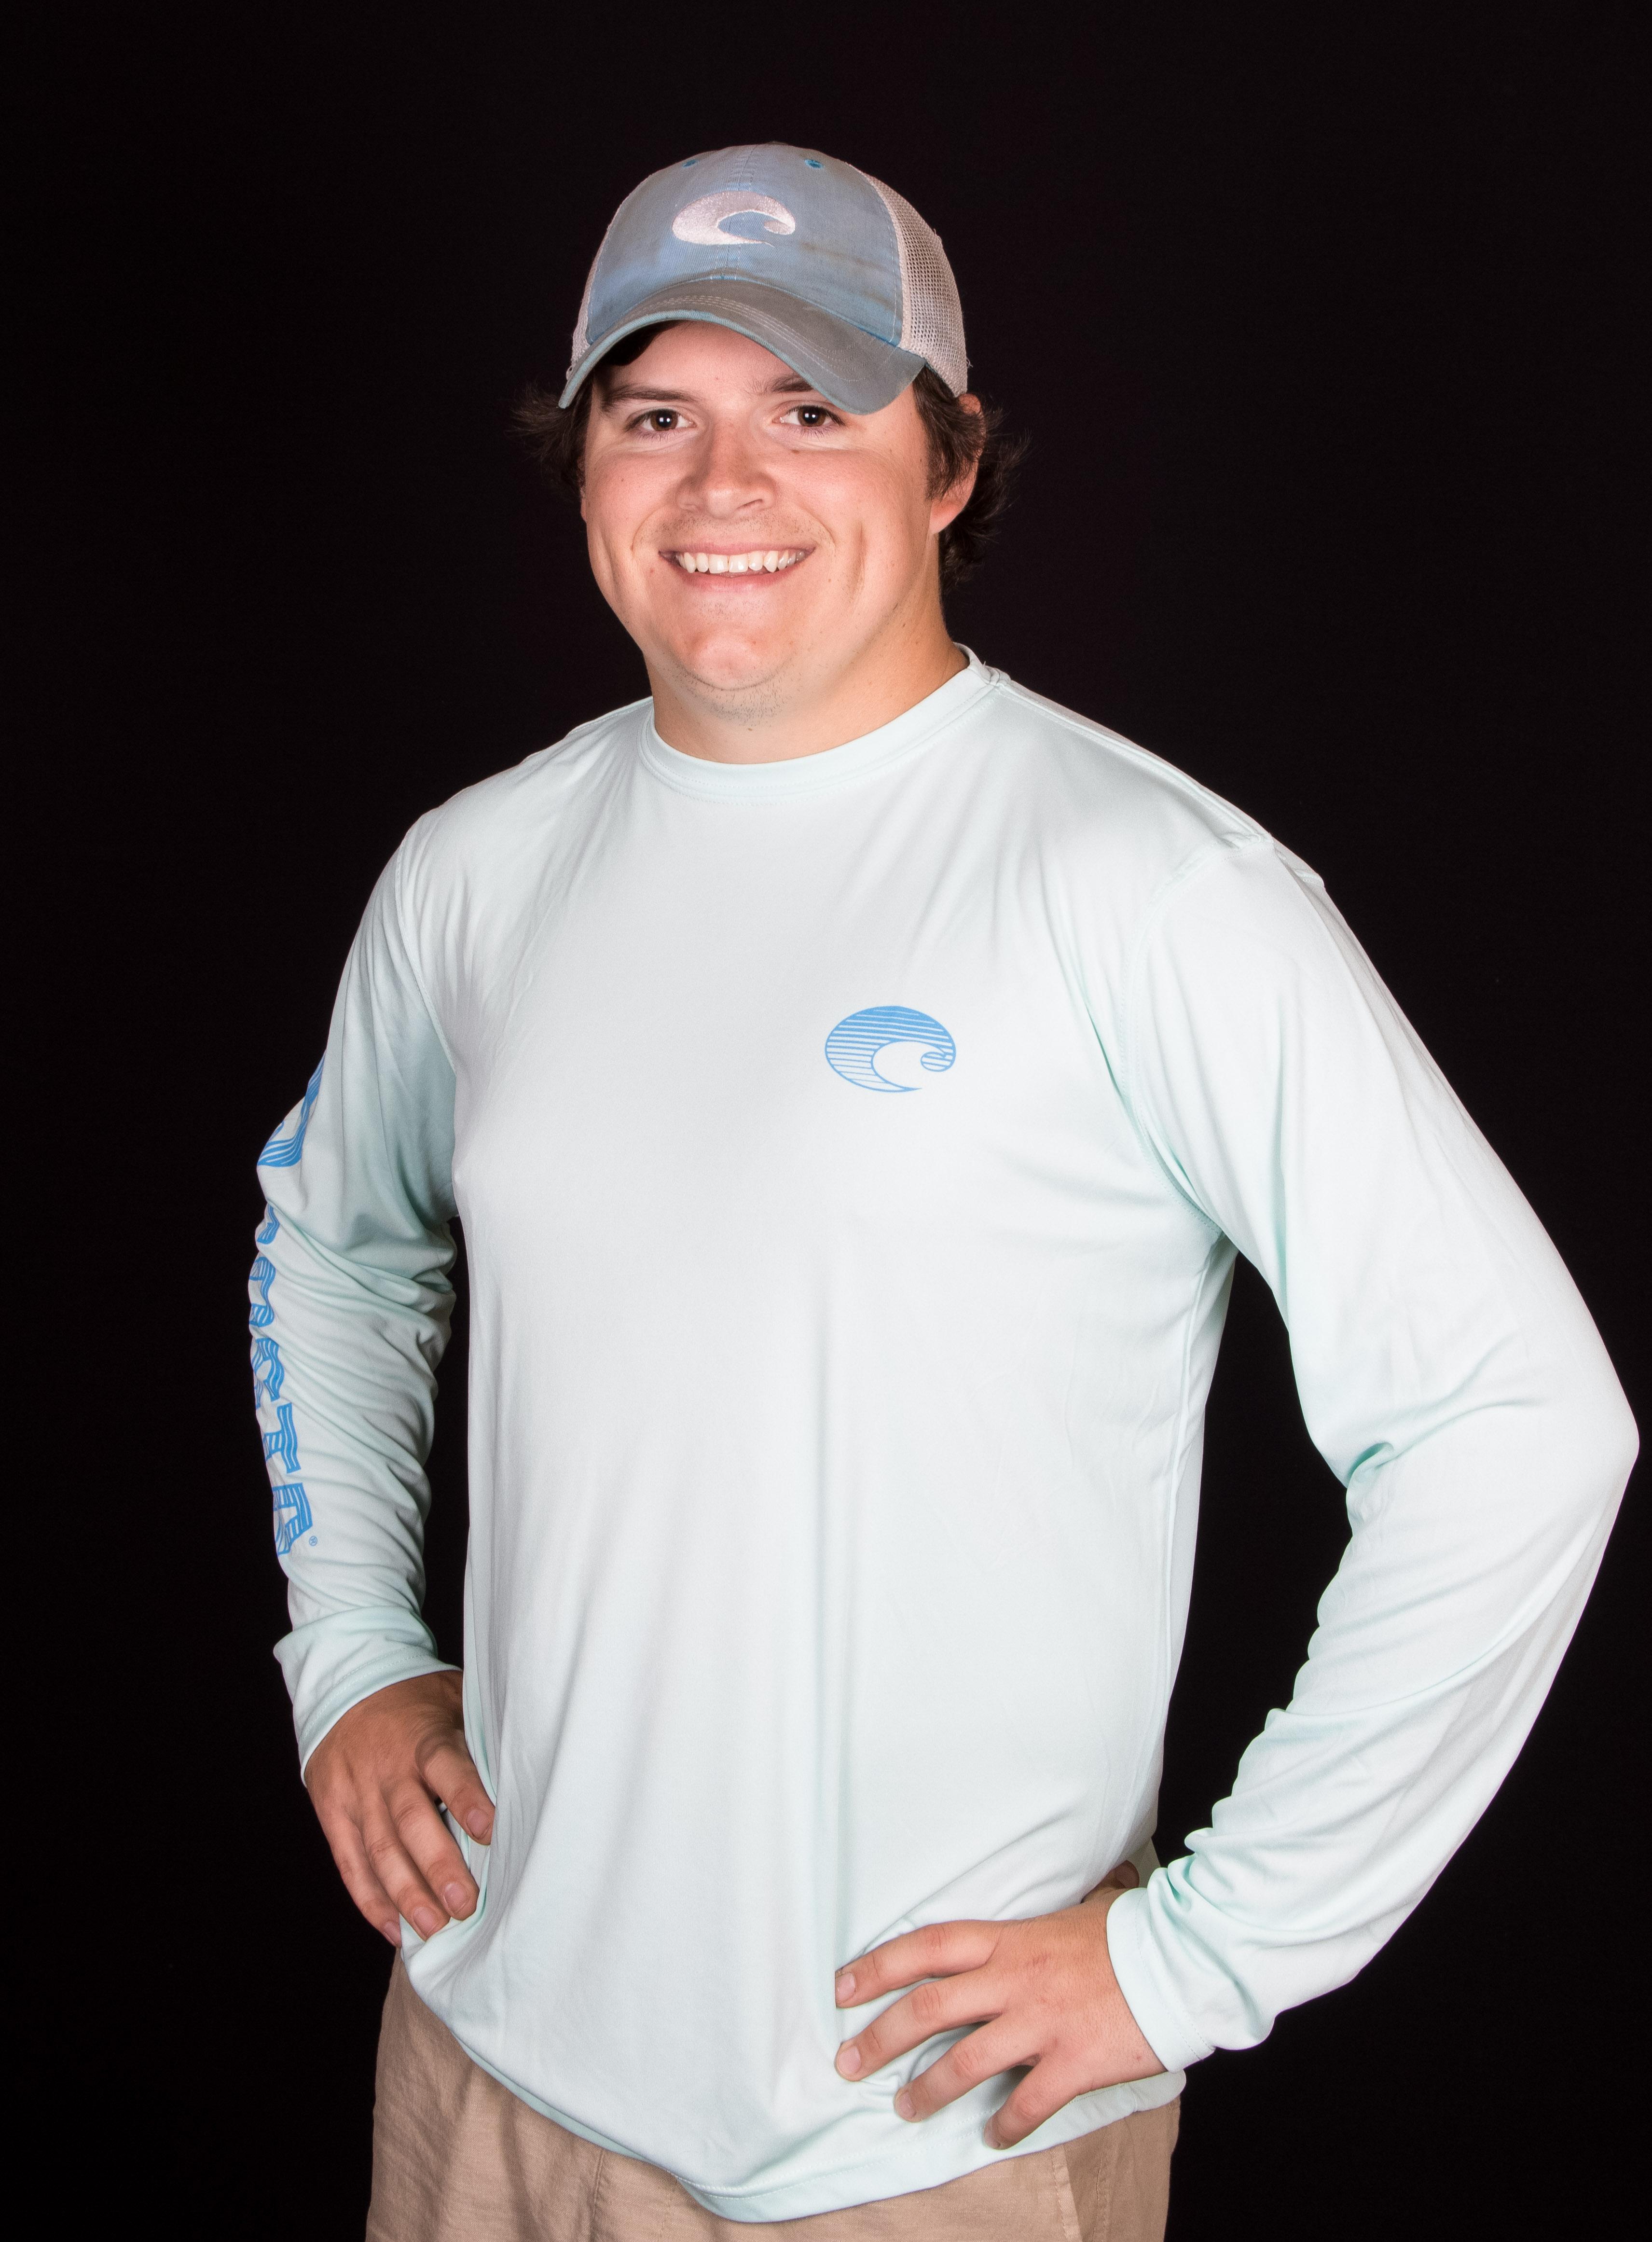 MLF Matthew Oconnell Profile